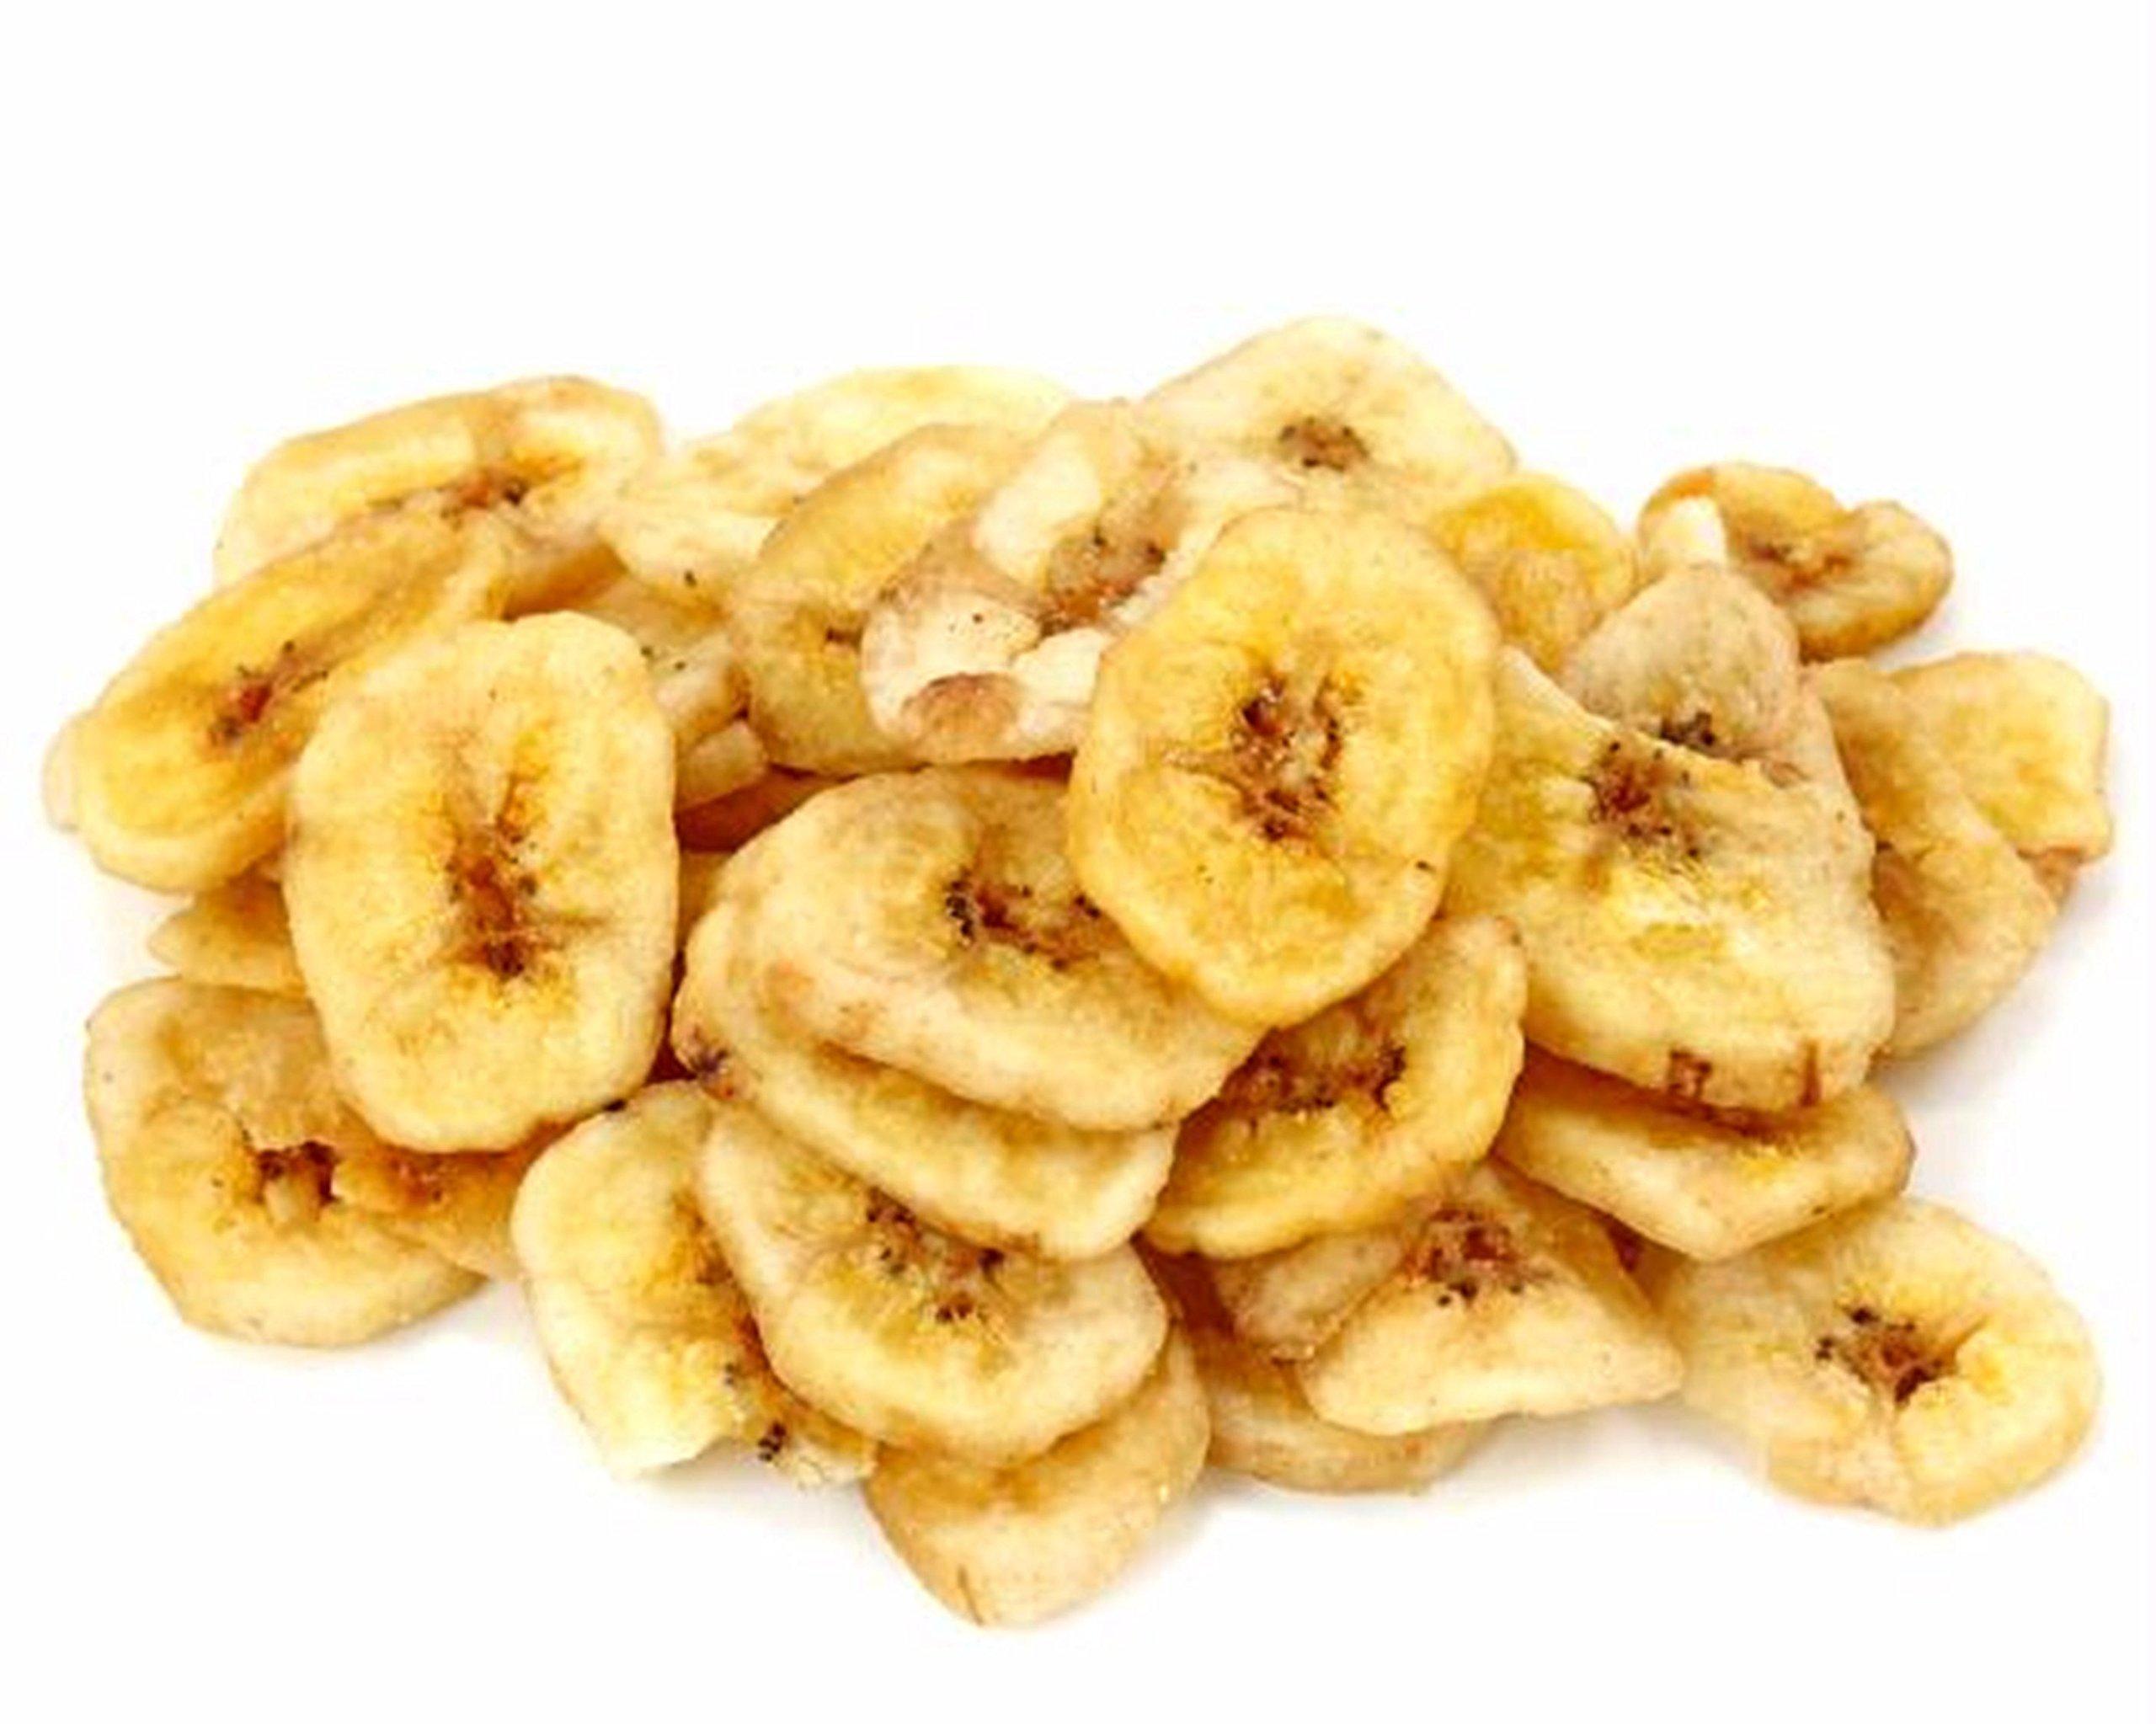 Fuzzy Ducks Gourmet Confections Dried Banana Chips (2/1 Pound Bag) Bulk Snacks Dried Fruit Potassium Rich Foods